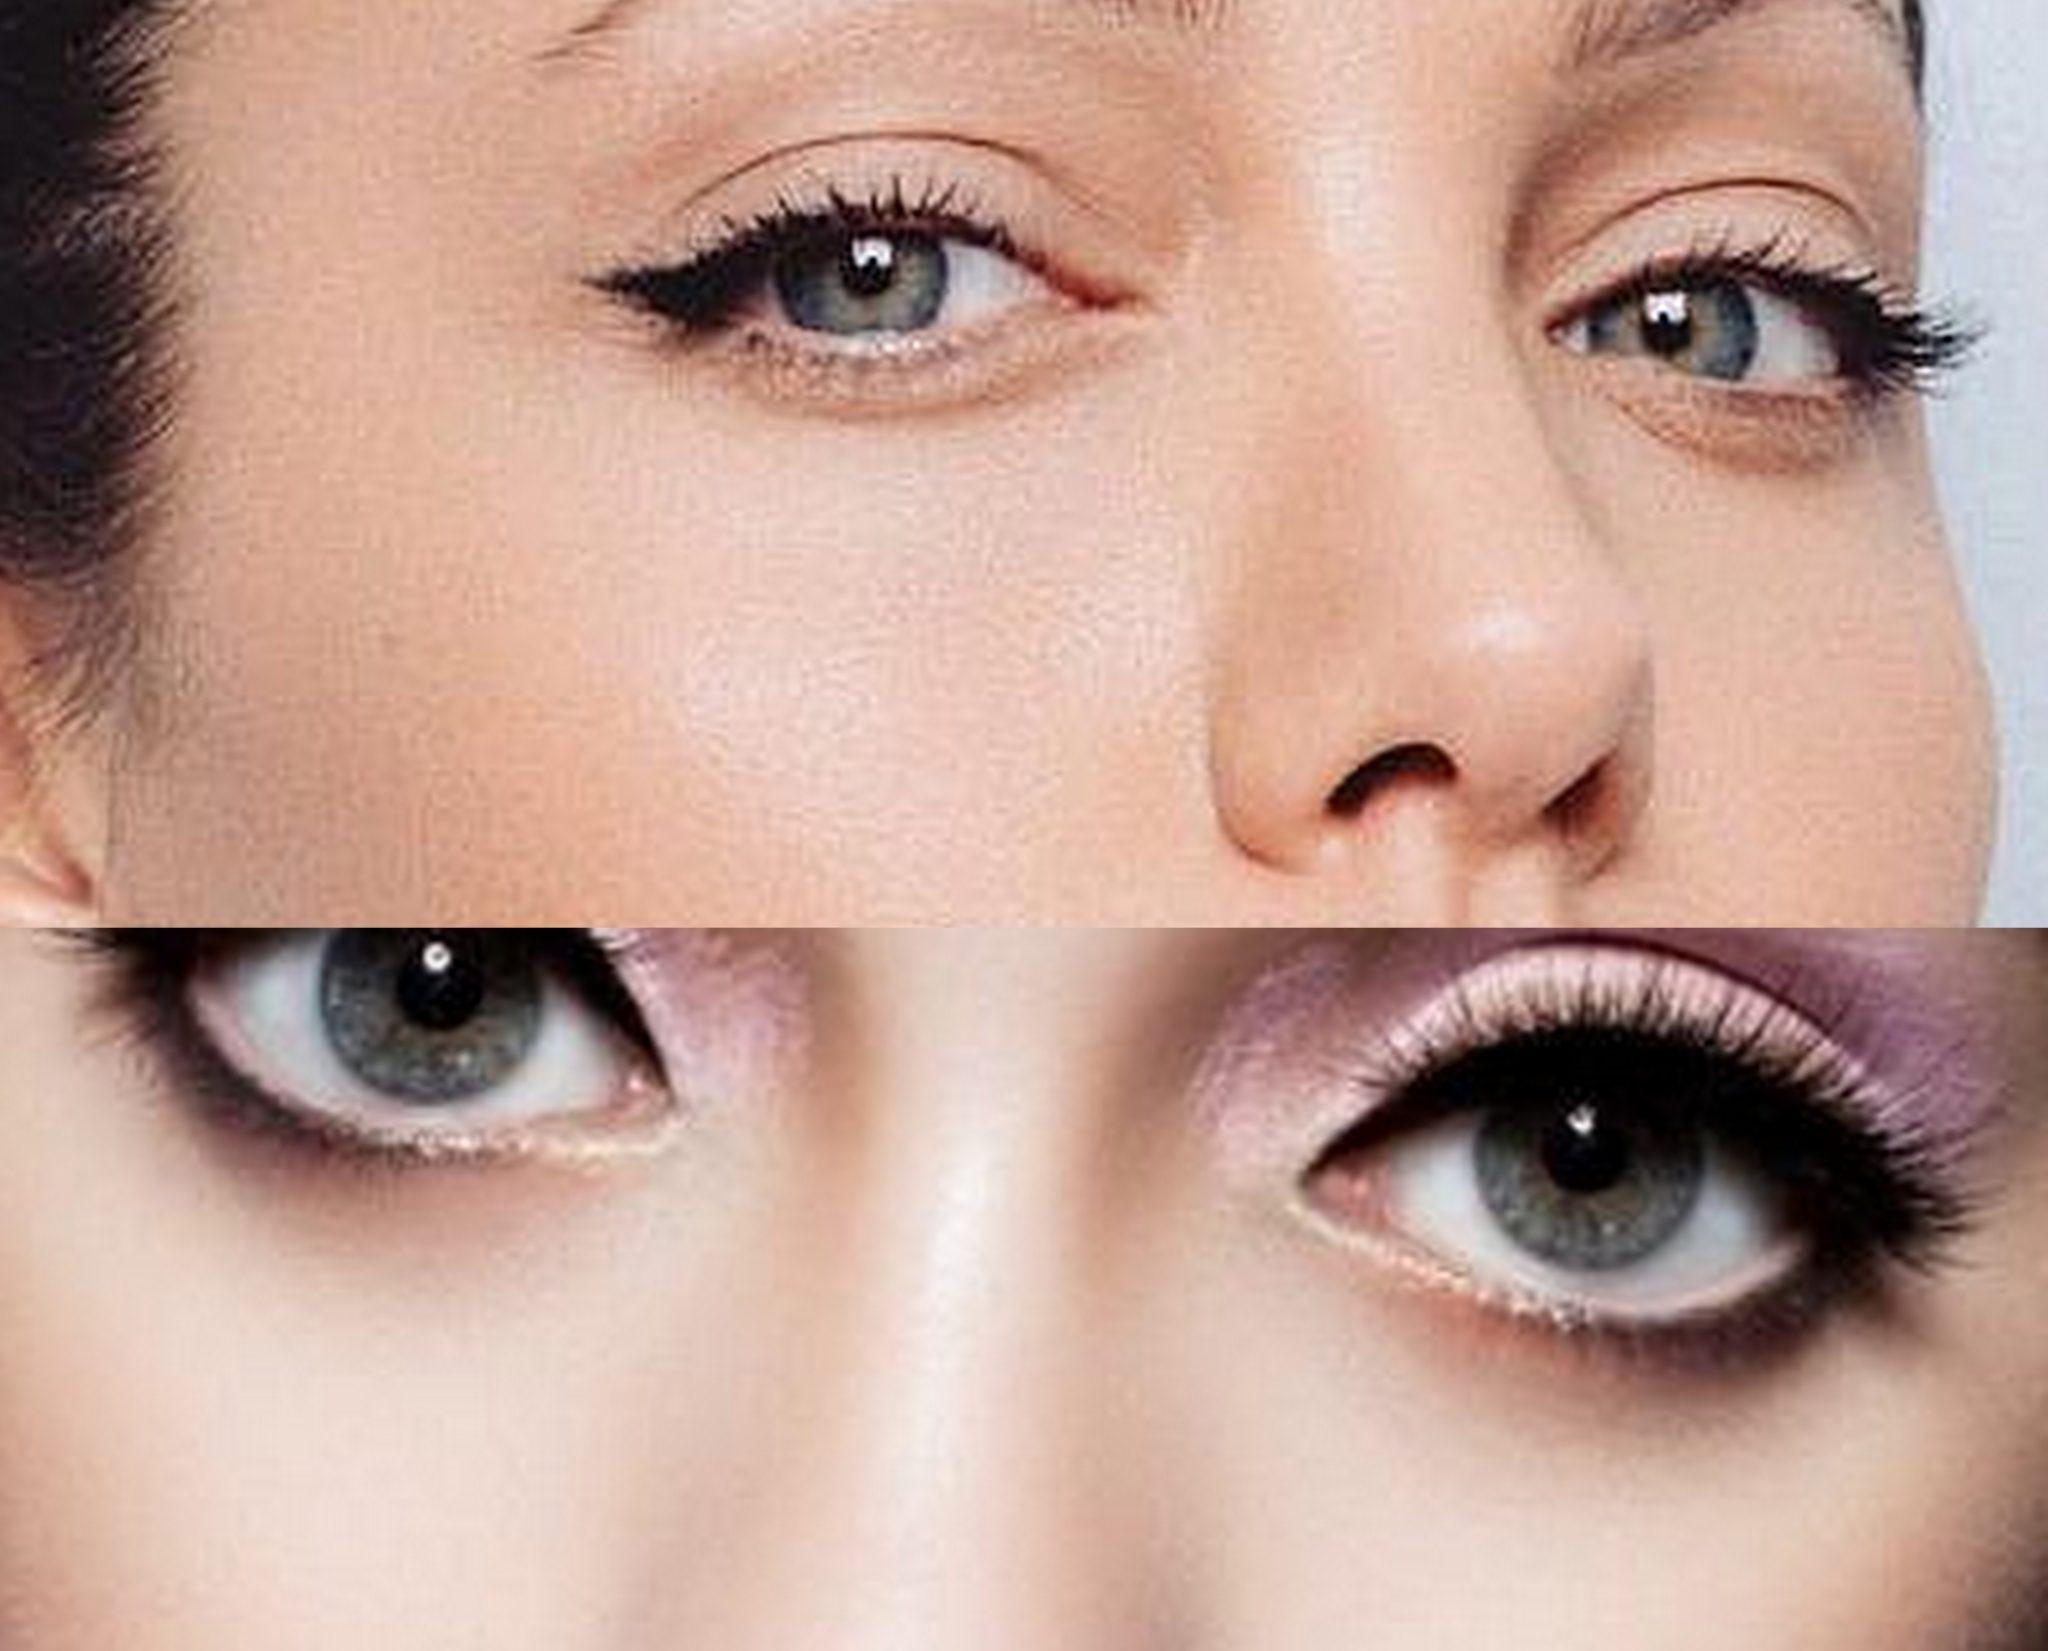 Eye Makeup For Small Eyes Make Them Look Bigger